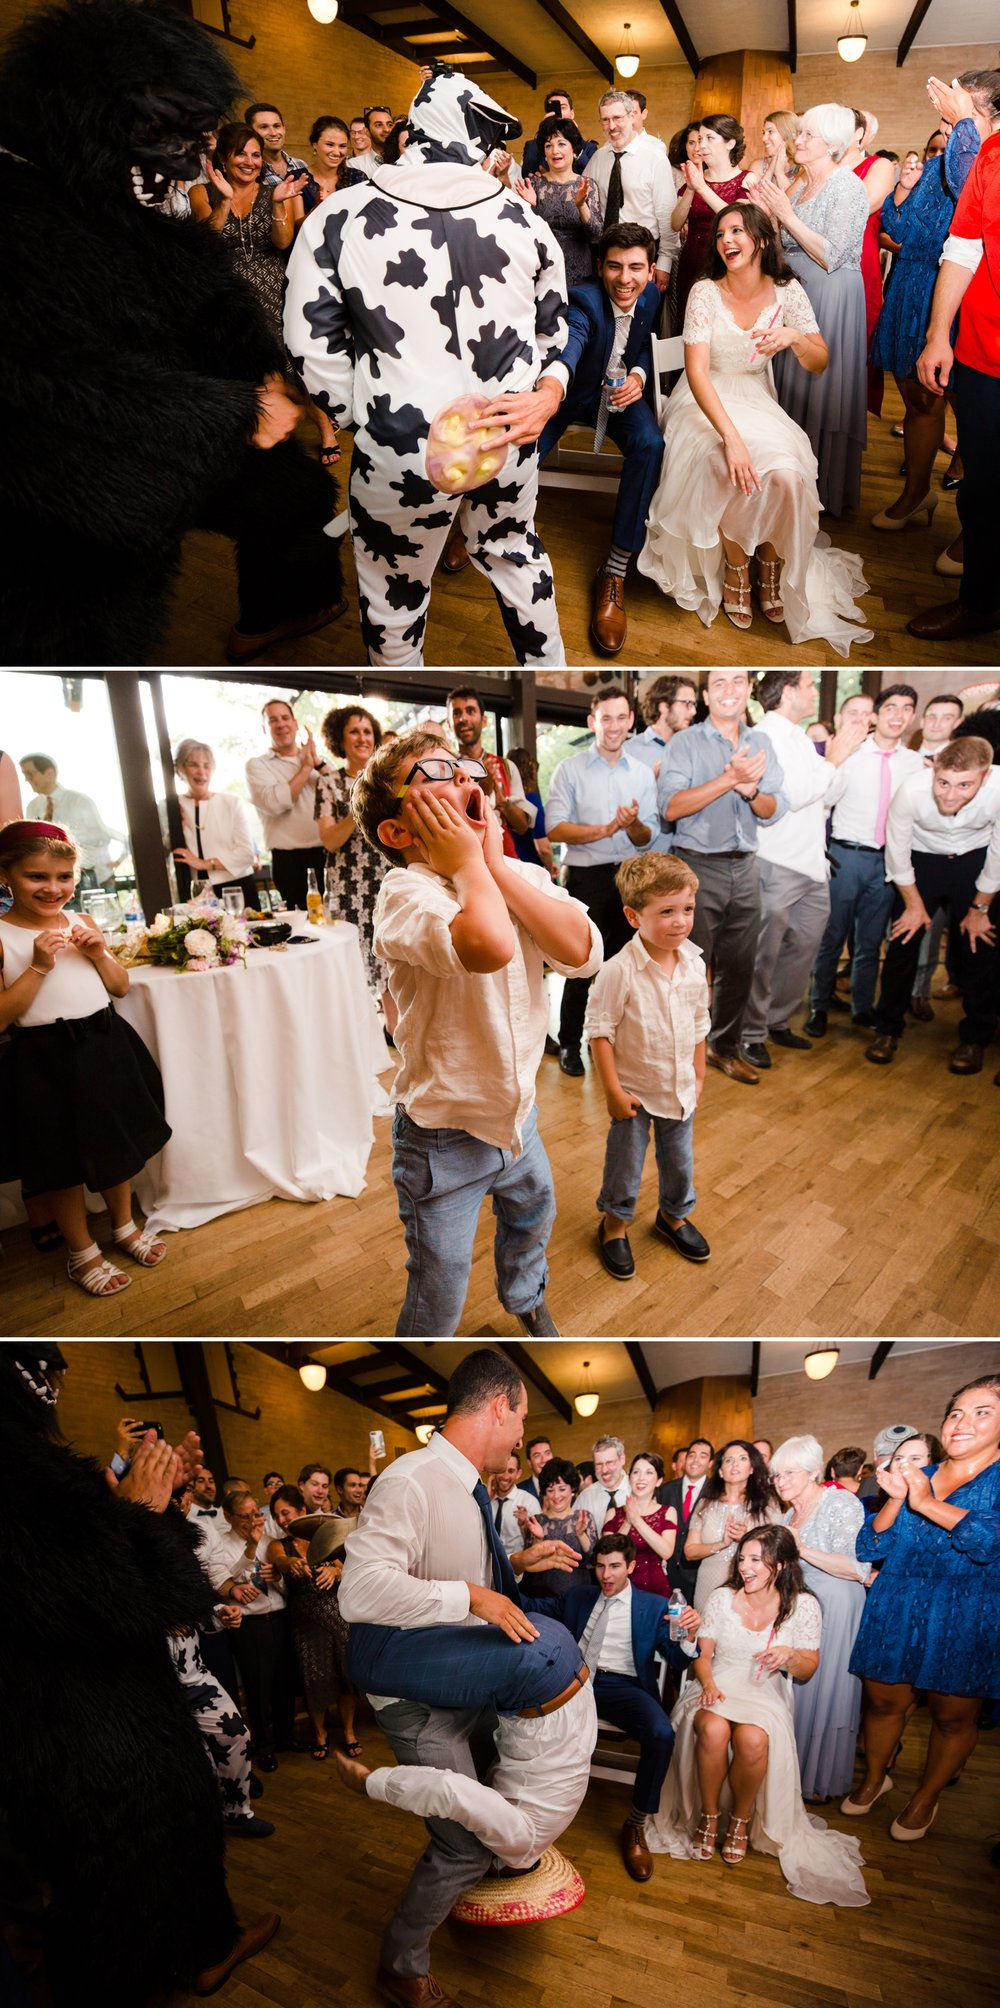 16-jewish-wedding-shtick-seattle.jpg